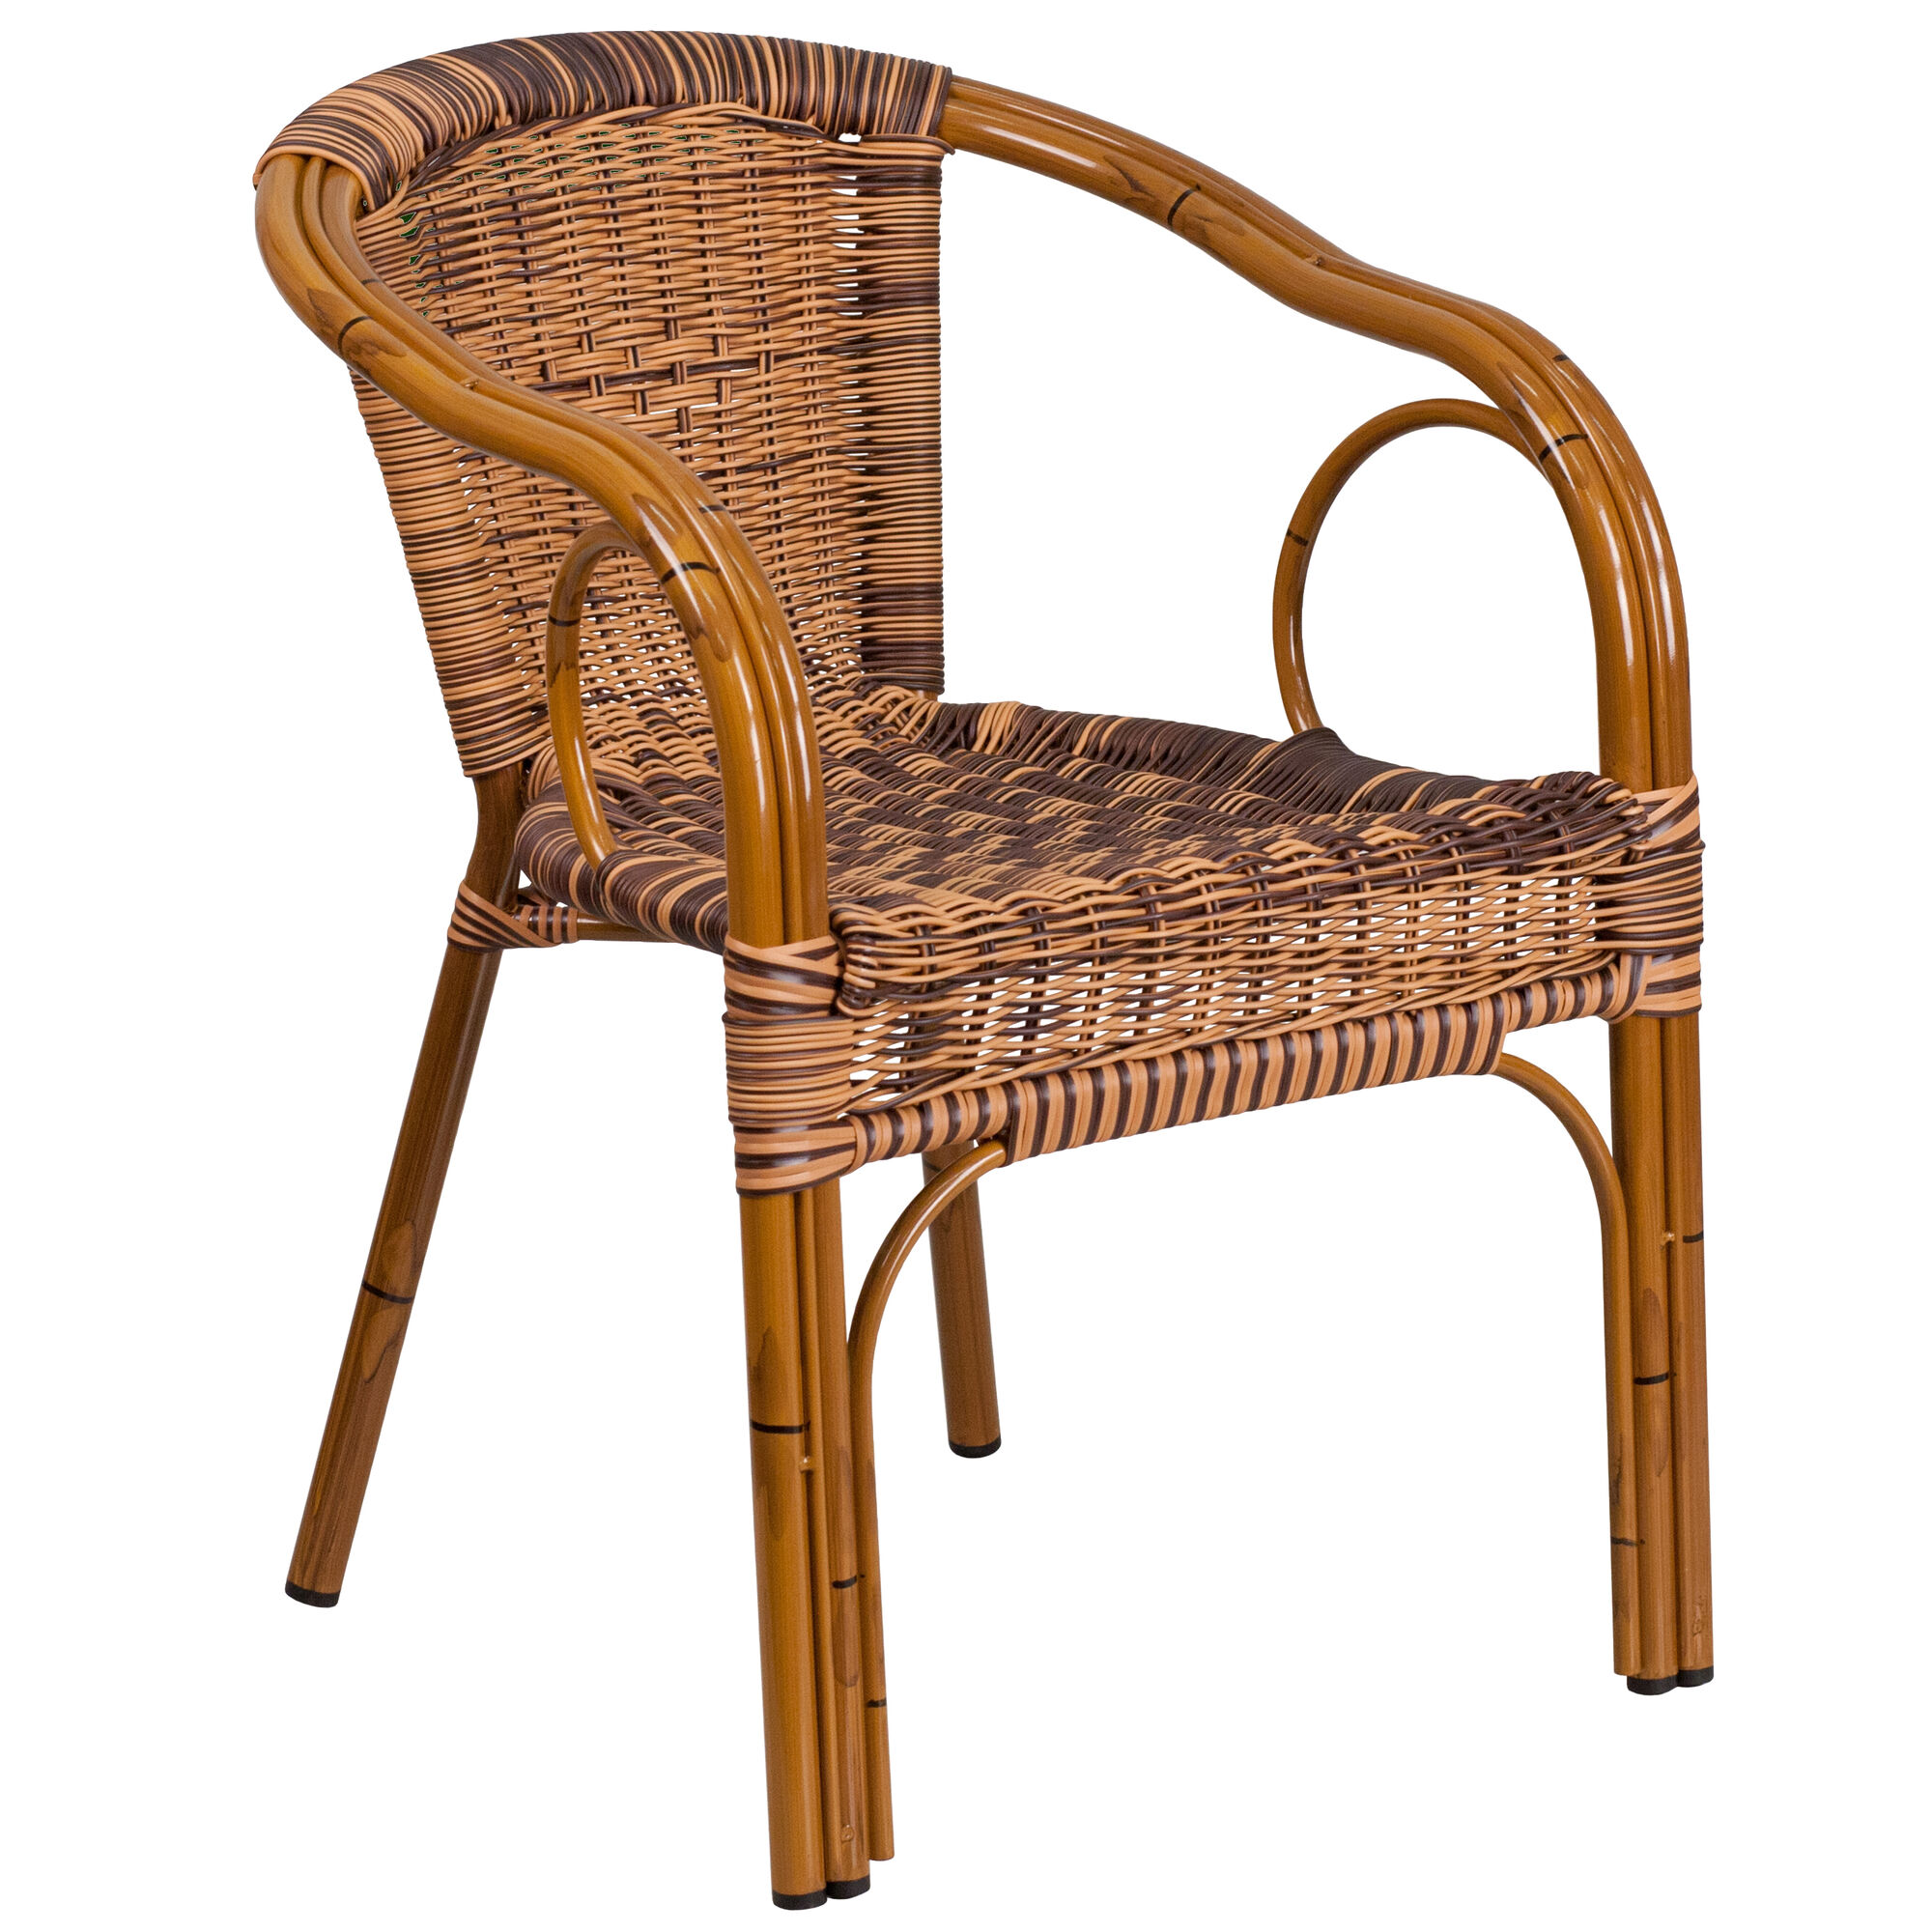 Bamboo Outdoor Chairs: Rattan Bamboo-Aluminum Chair SDA-AD632009D-1-GG